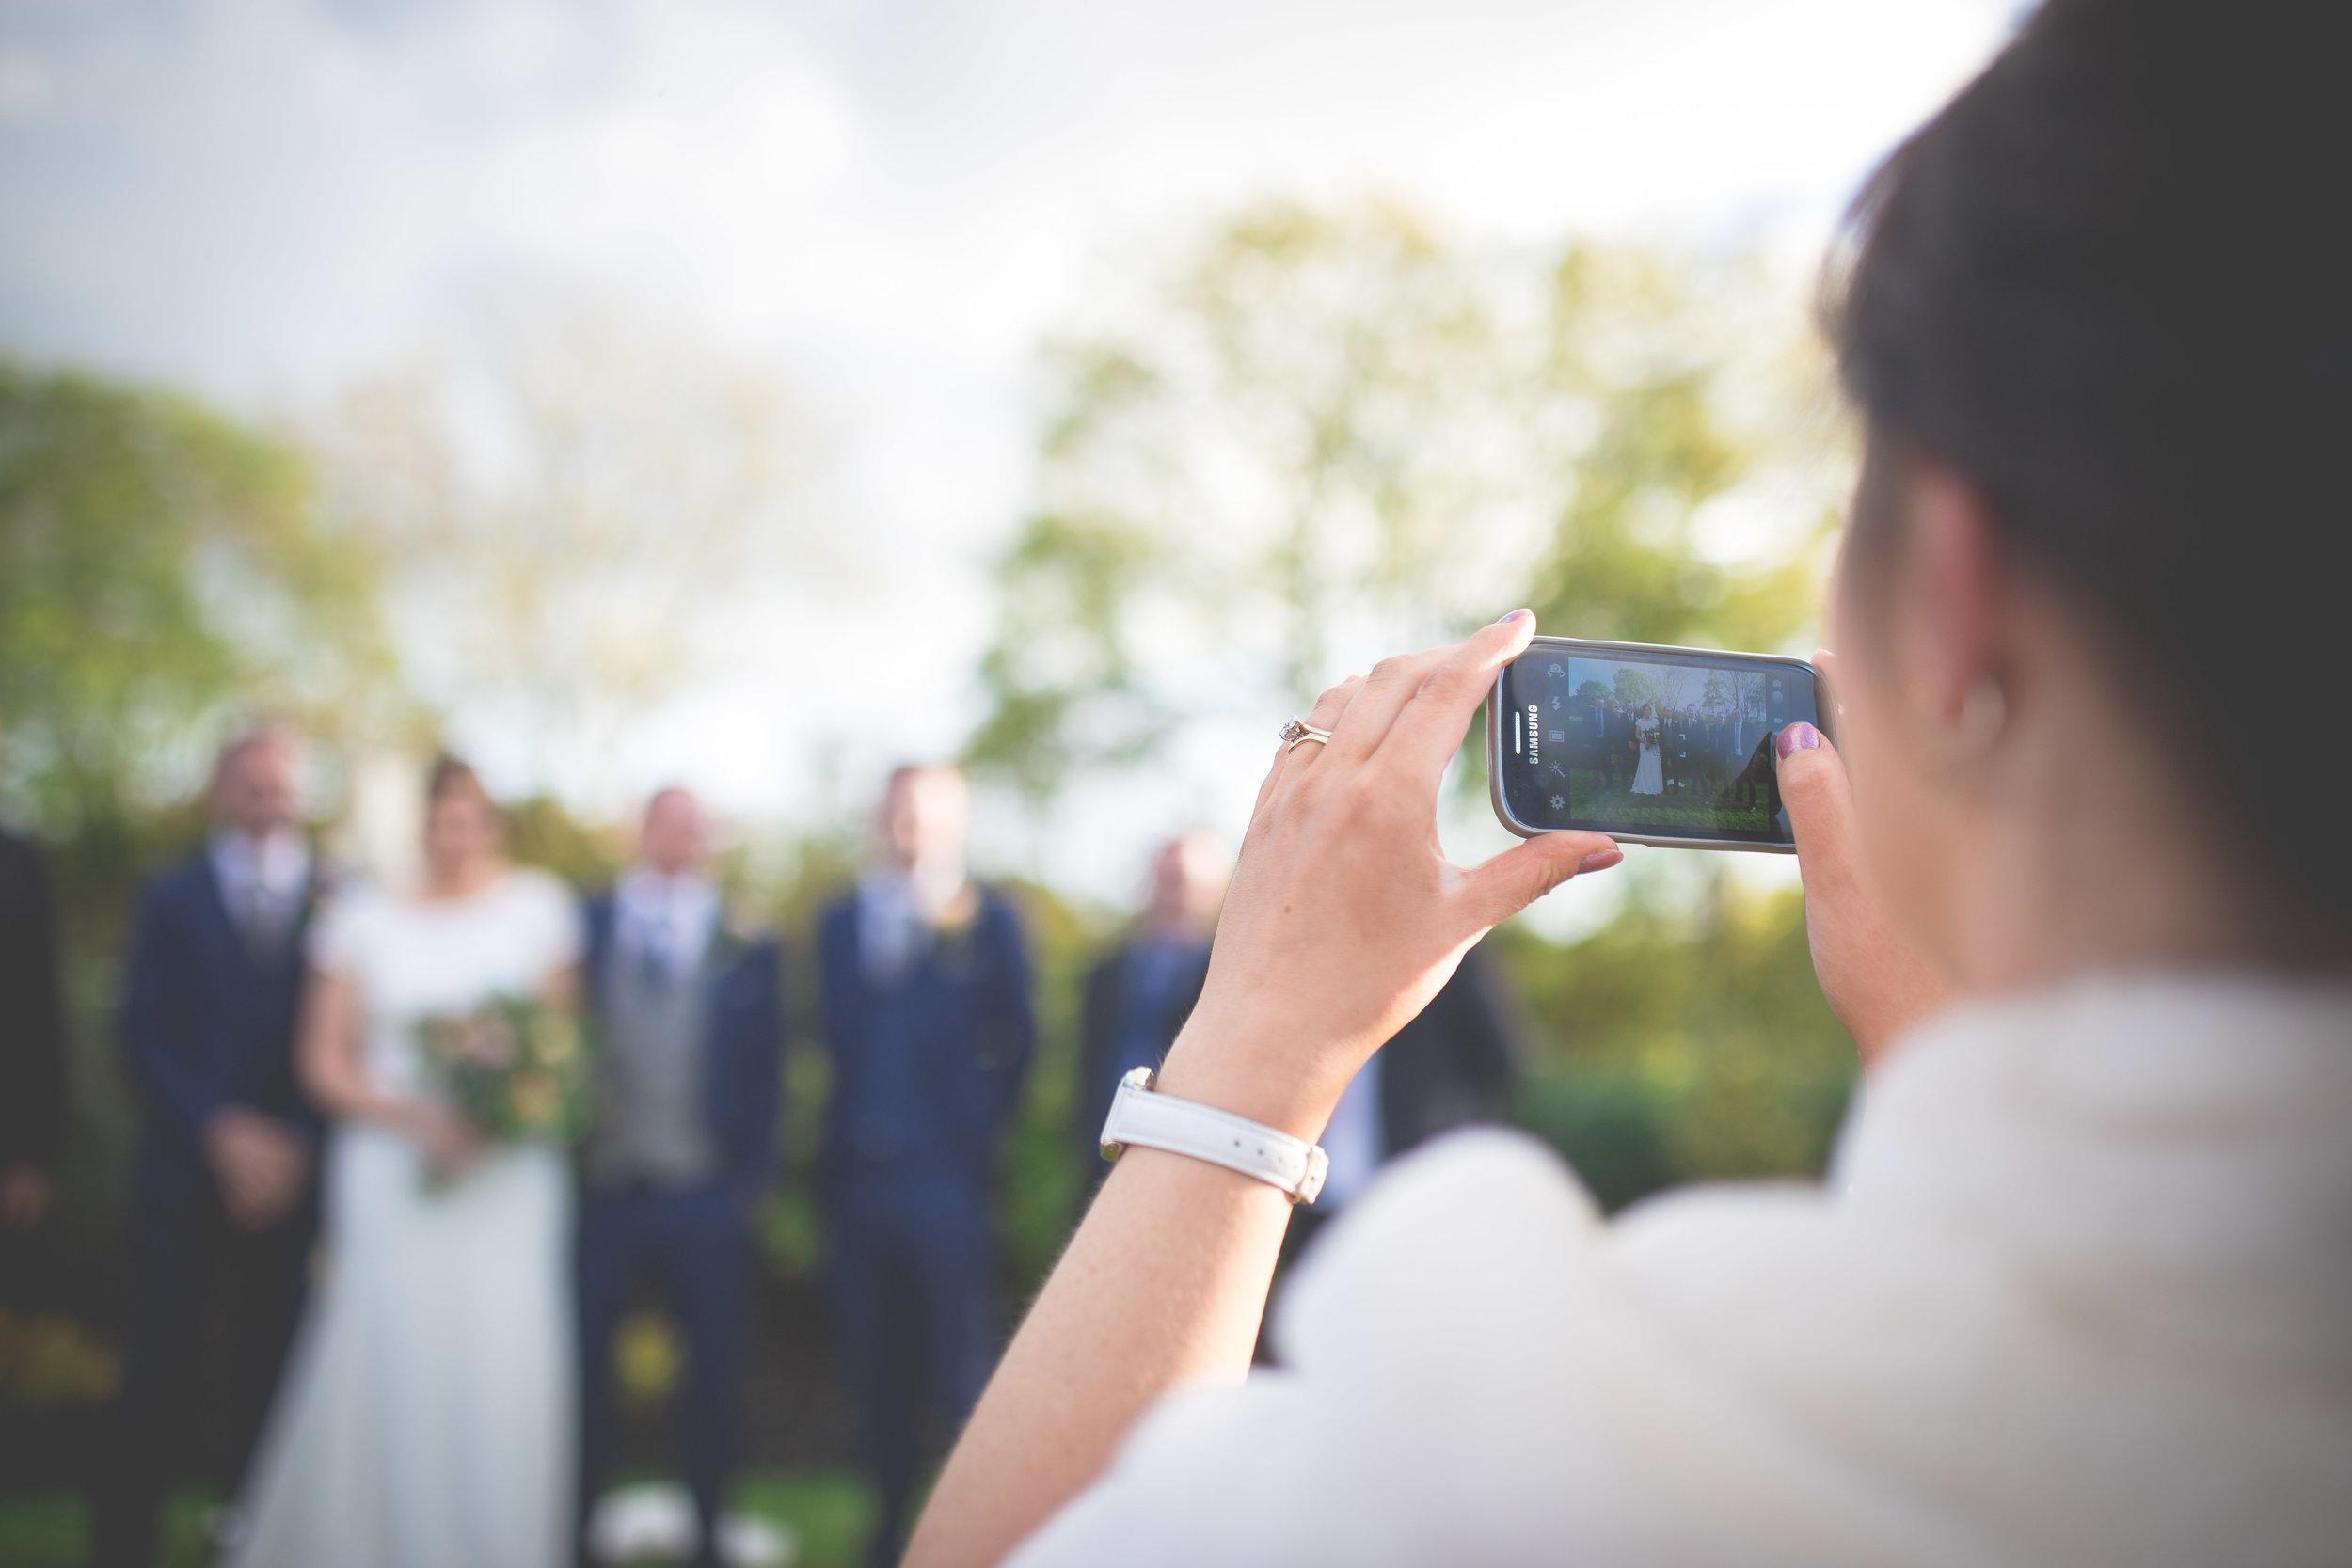 Northern Ireland Wedding Photographer   Brian McEwan Photography   Affordable Wedding Photography Throughout Antrim Down Armagh Tyrone Londonderry Derry Down Fermanagh -69.jpg